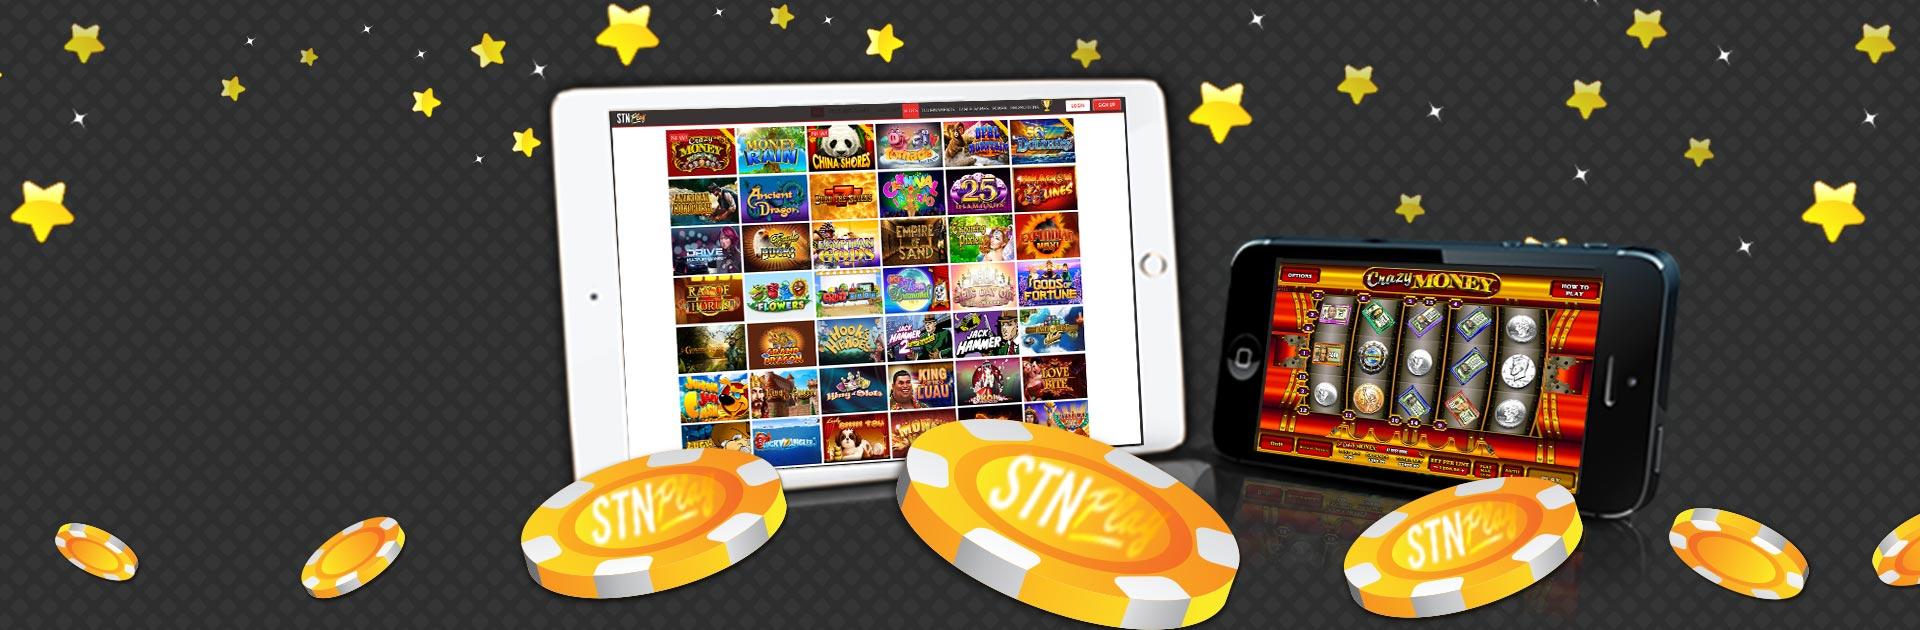 Station casino slot tournament emerald queen casino and hotel